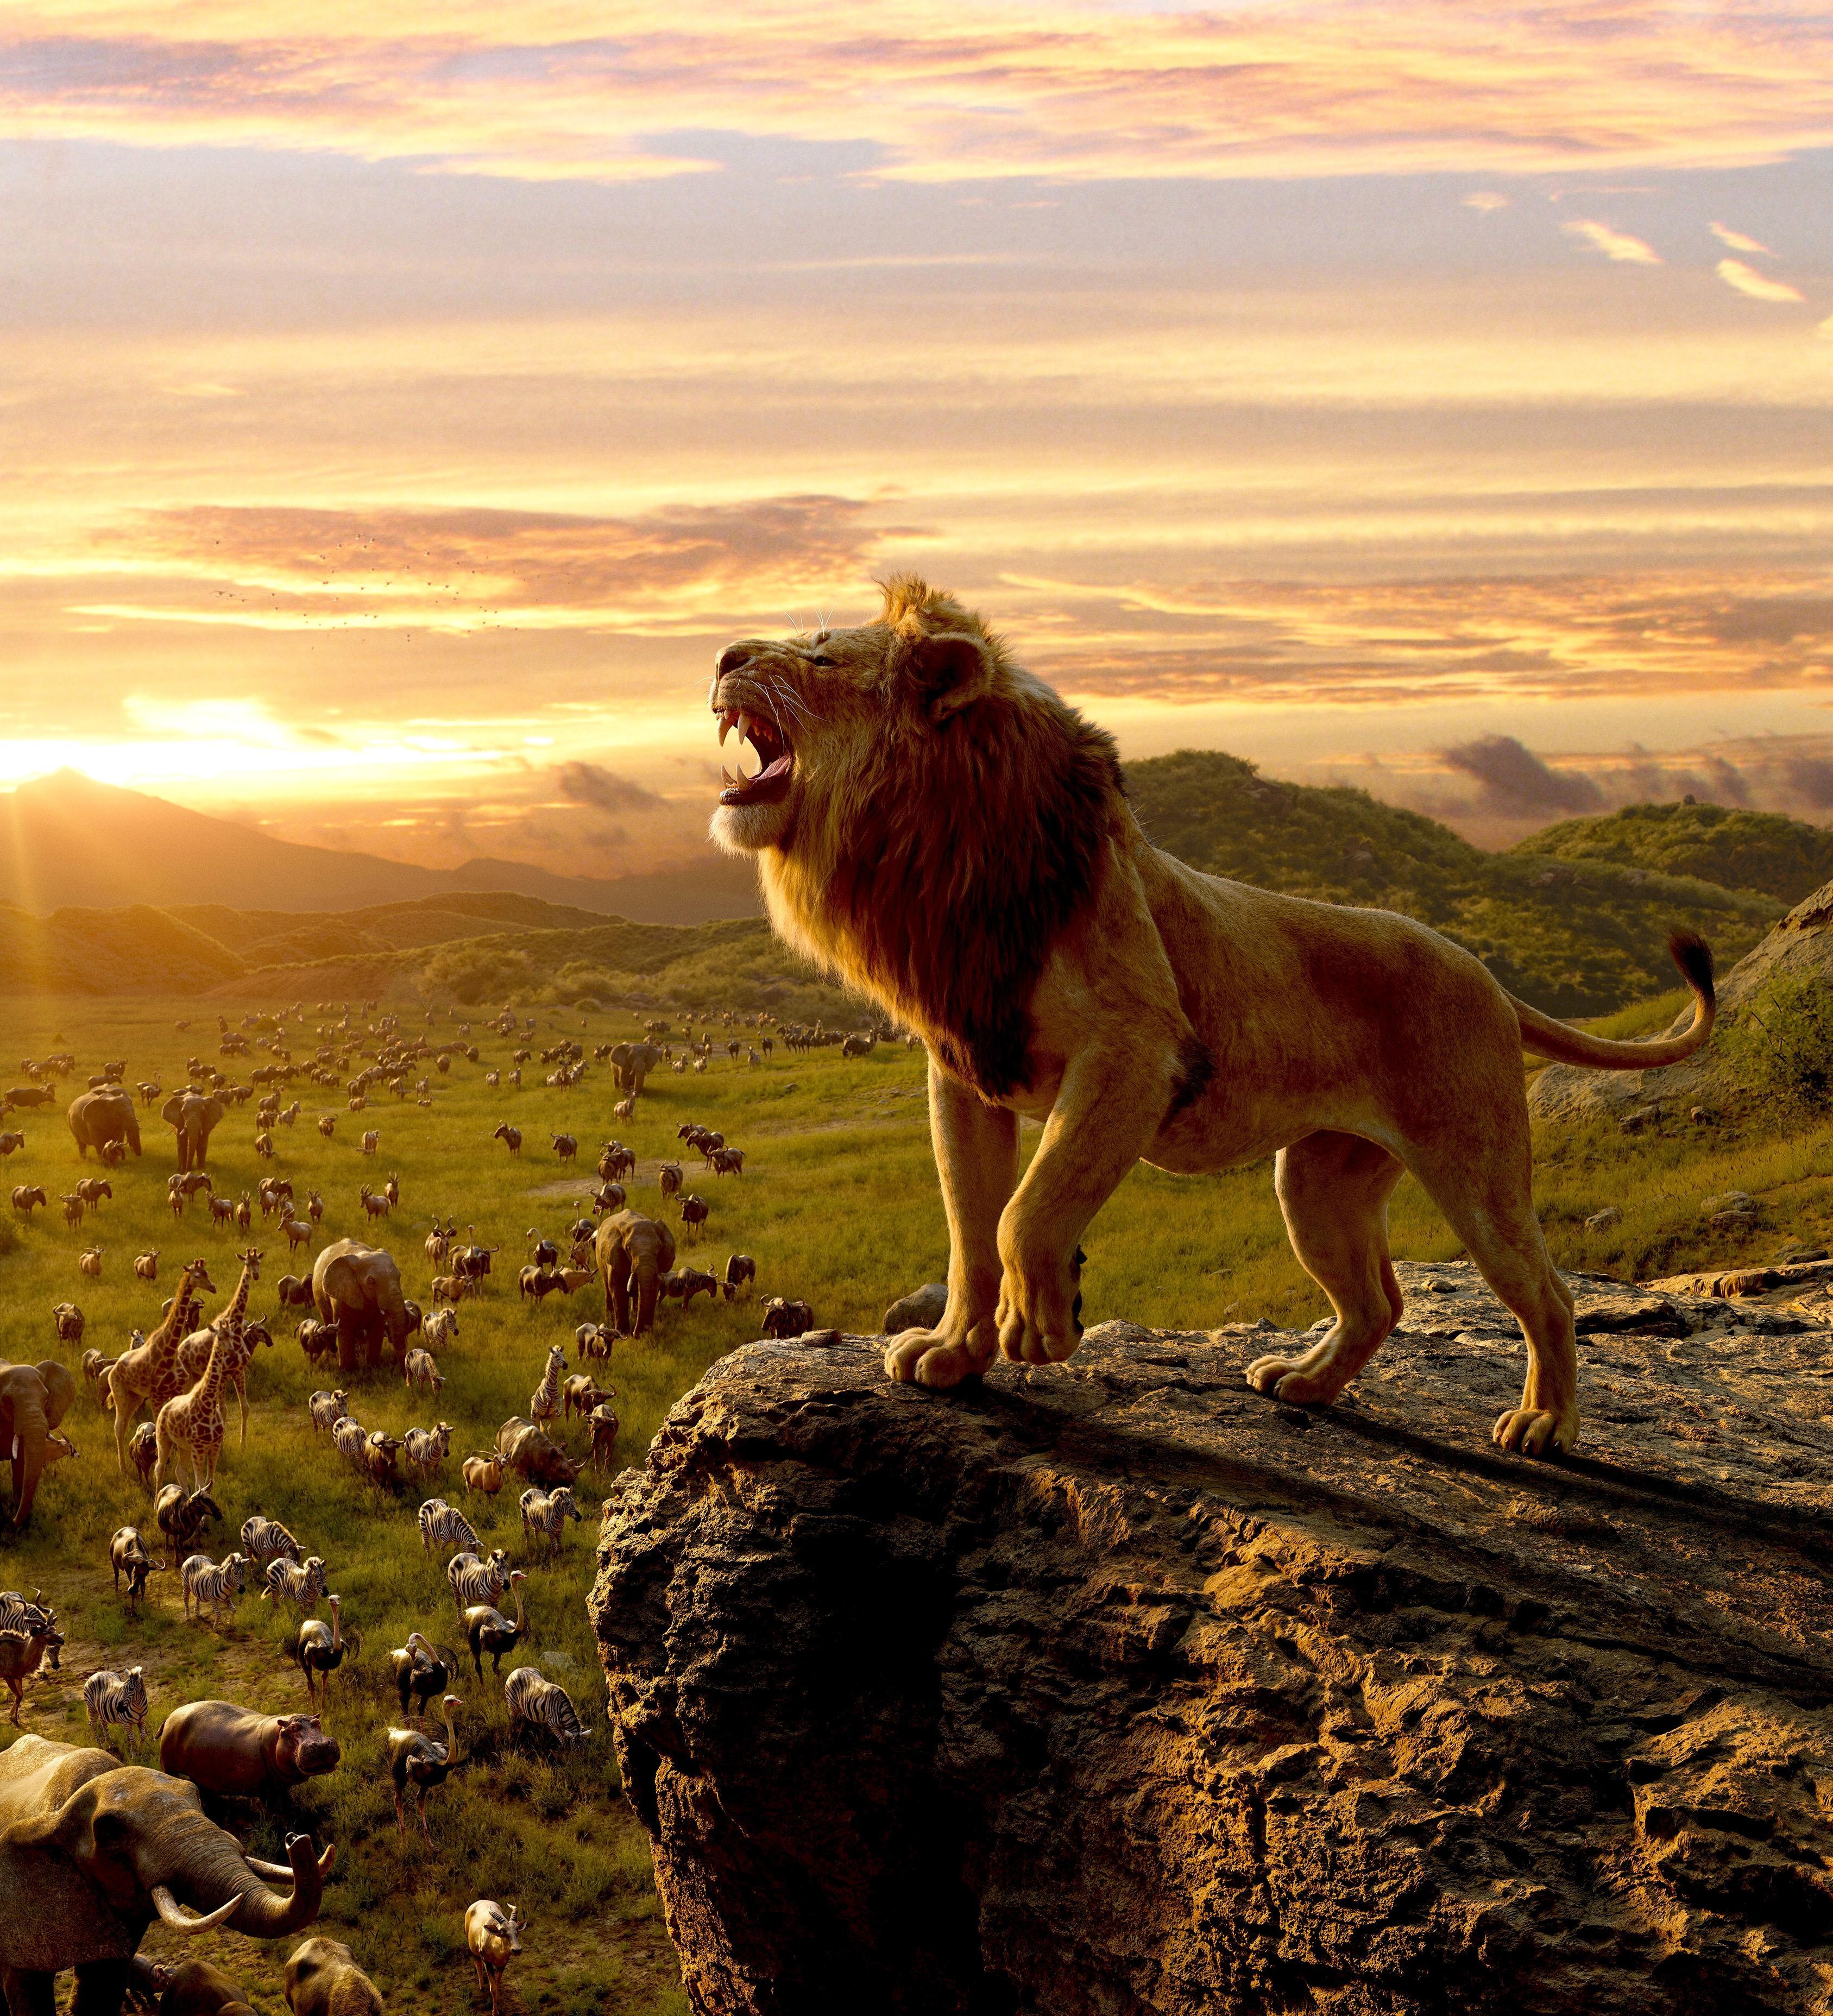 Lion King Roar Wallpapers - Wallpaper Cave